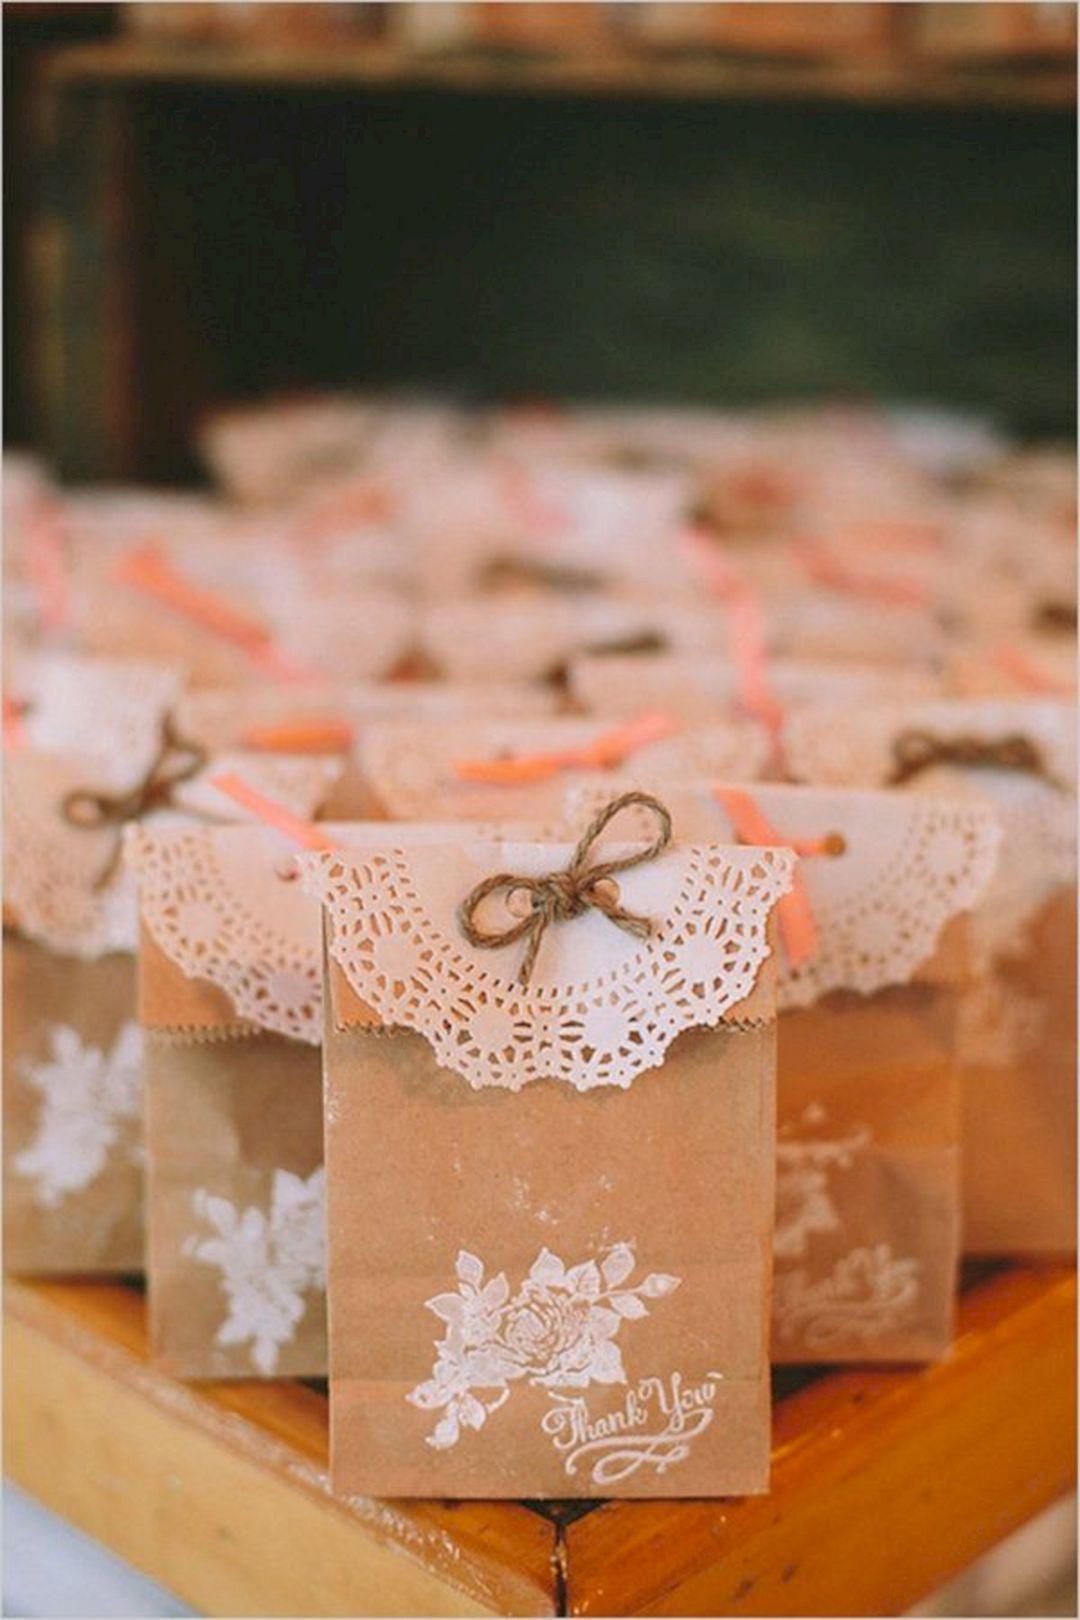 23 Marvelous Rustic Wedding Favors Ideas That Make Your Guest Happy Diy Wedding Favors Wedding Gift Favors Diy Wedding Favors Cheap